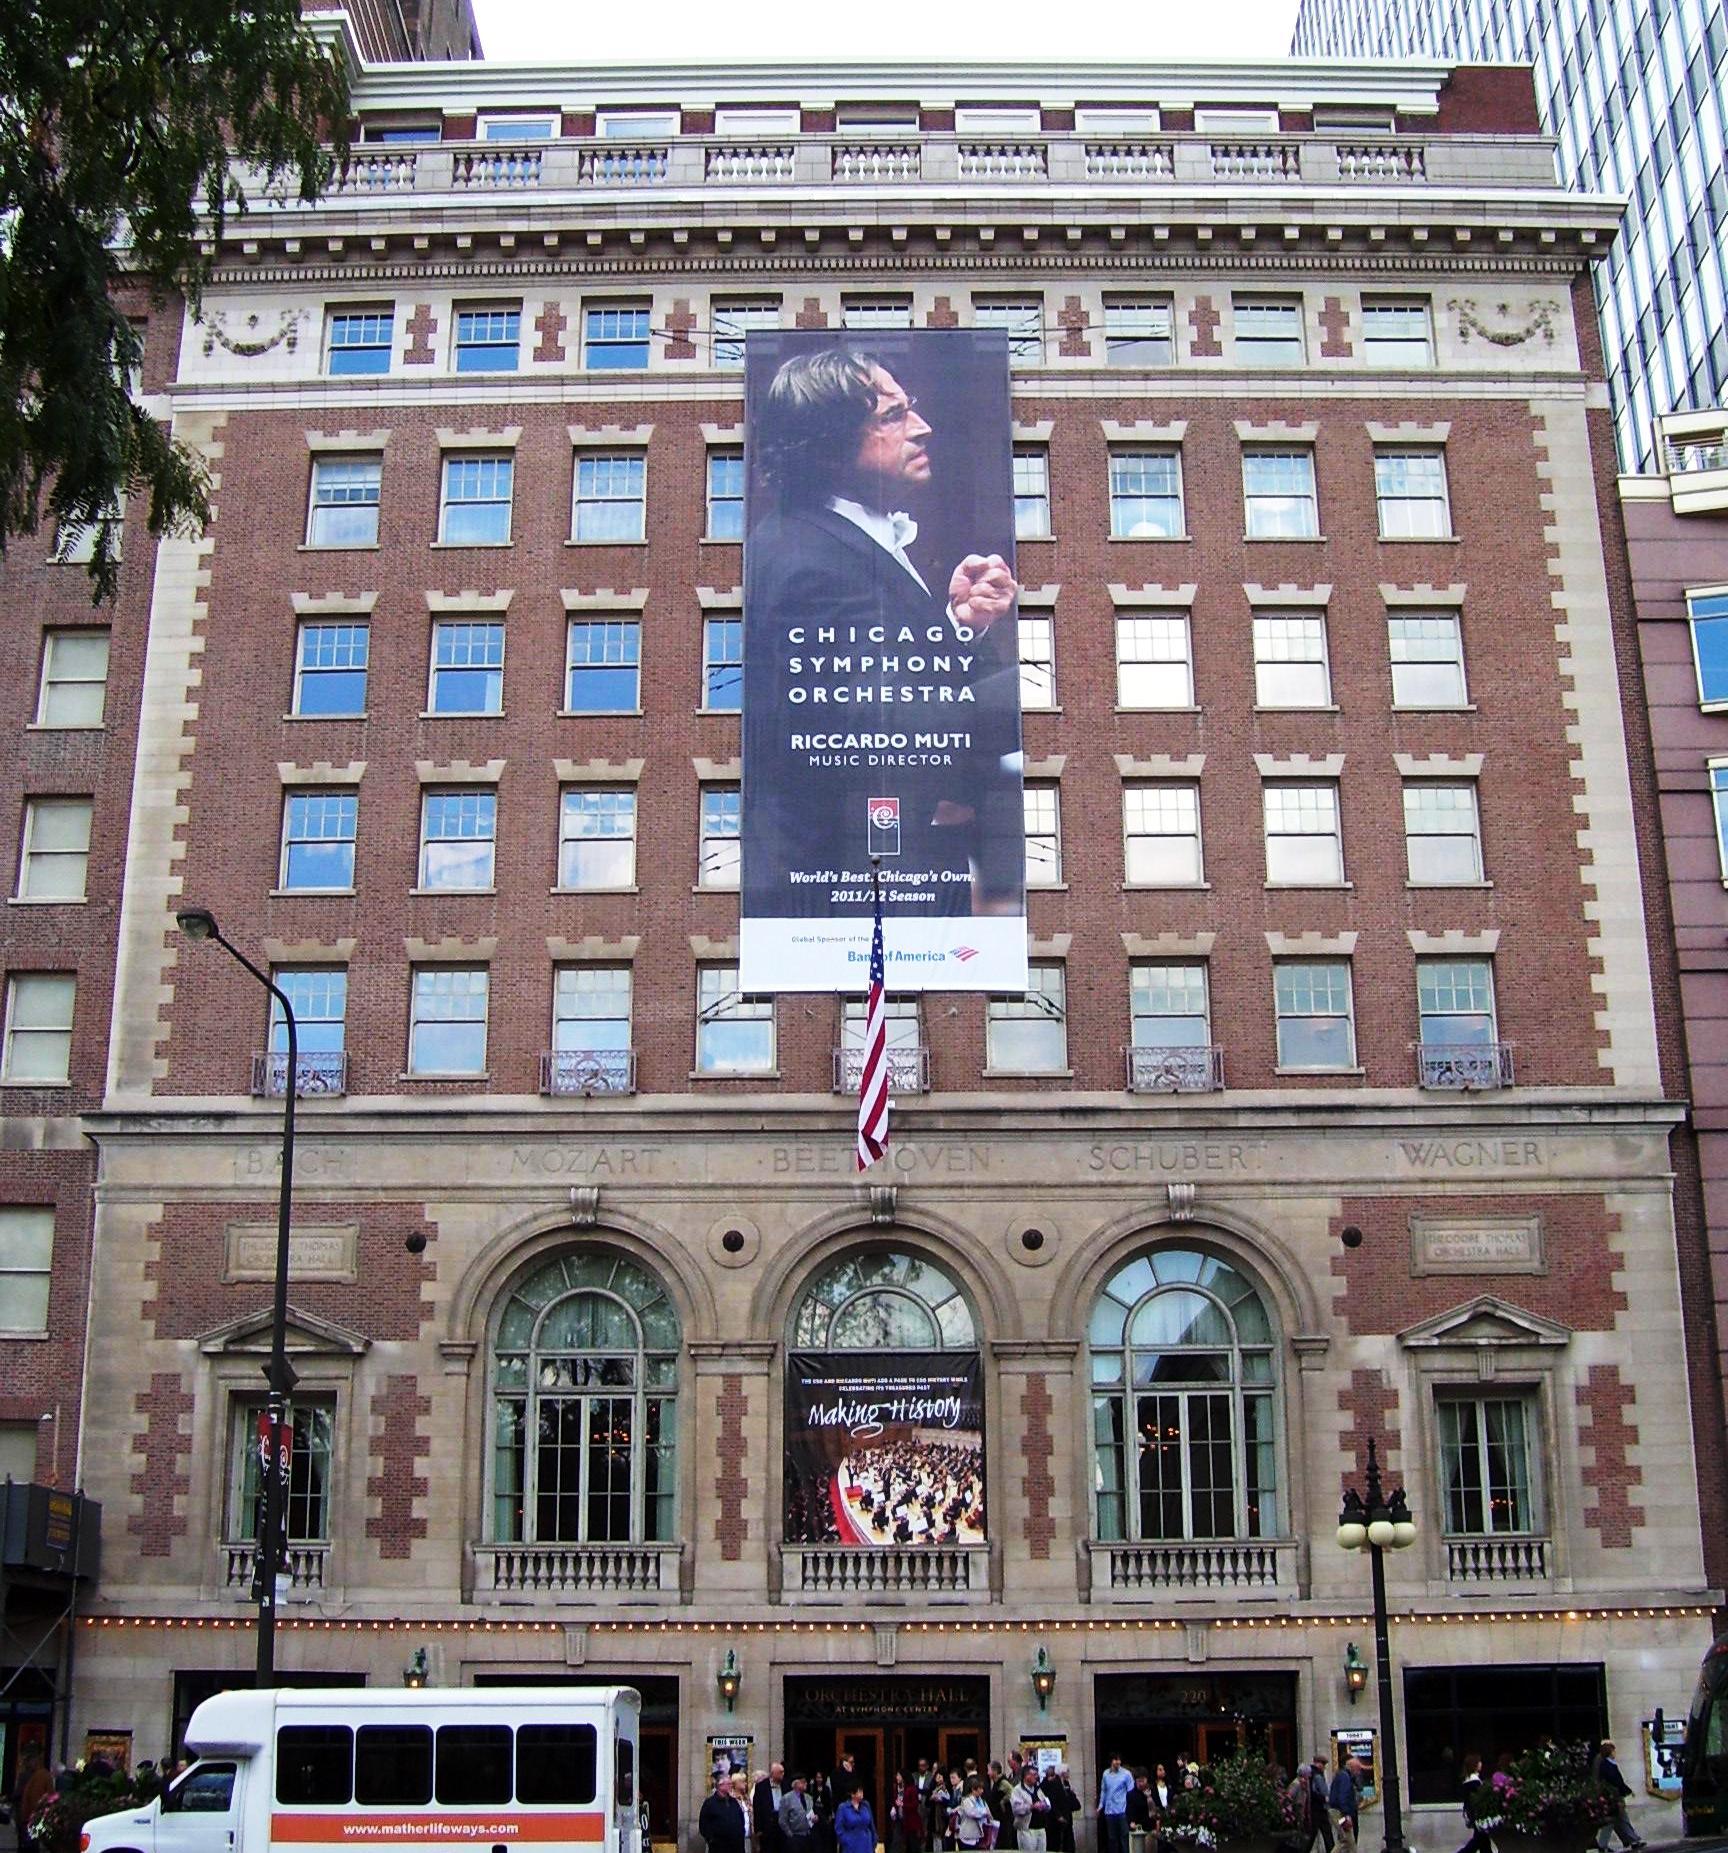 Orchestra Hall Chicago.jpg